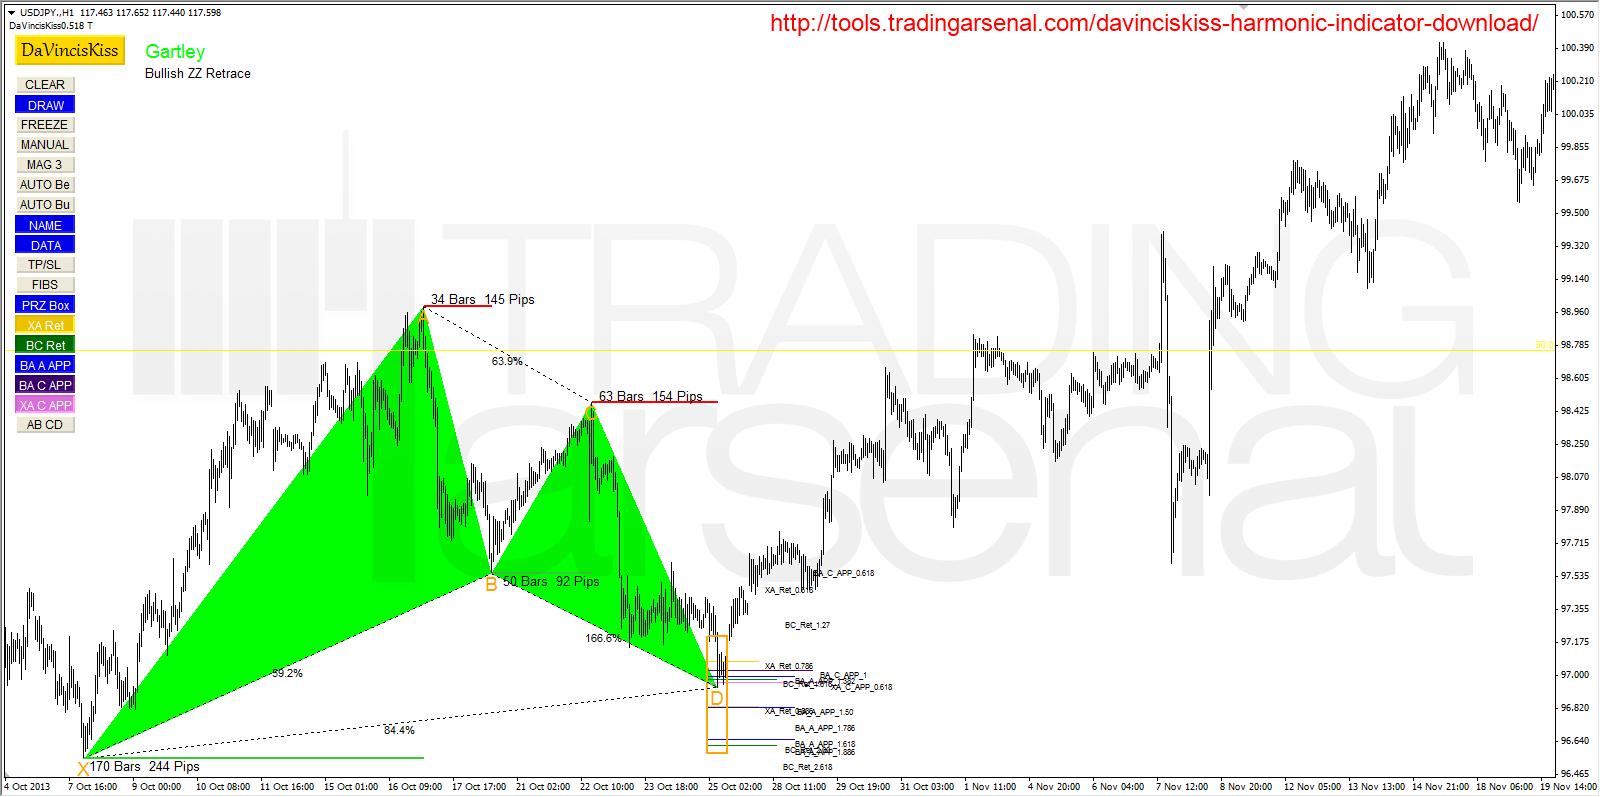 DaVincisKiss harmonic trading indicator